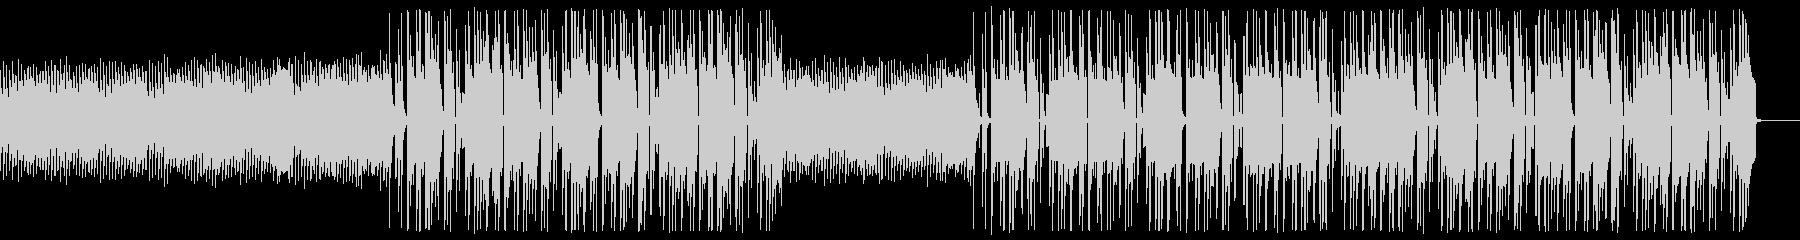 EDMチックなヒップホップの未再生の波形